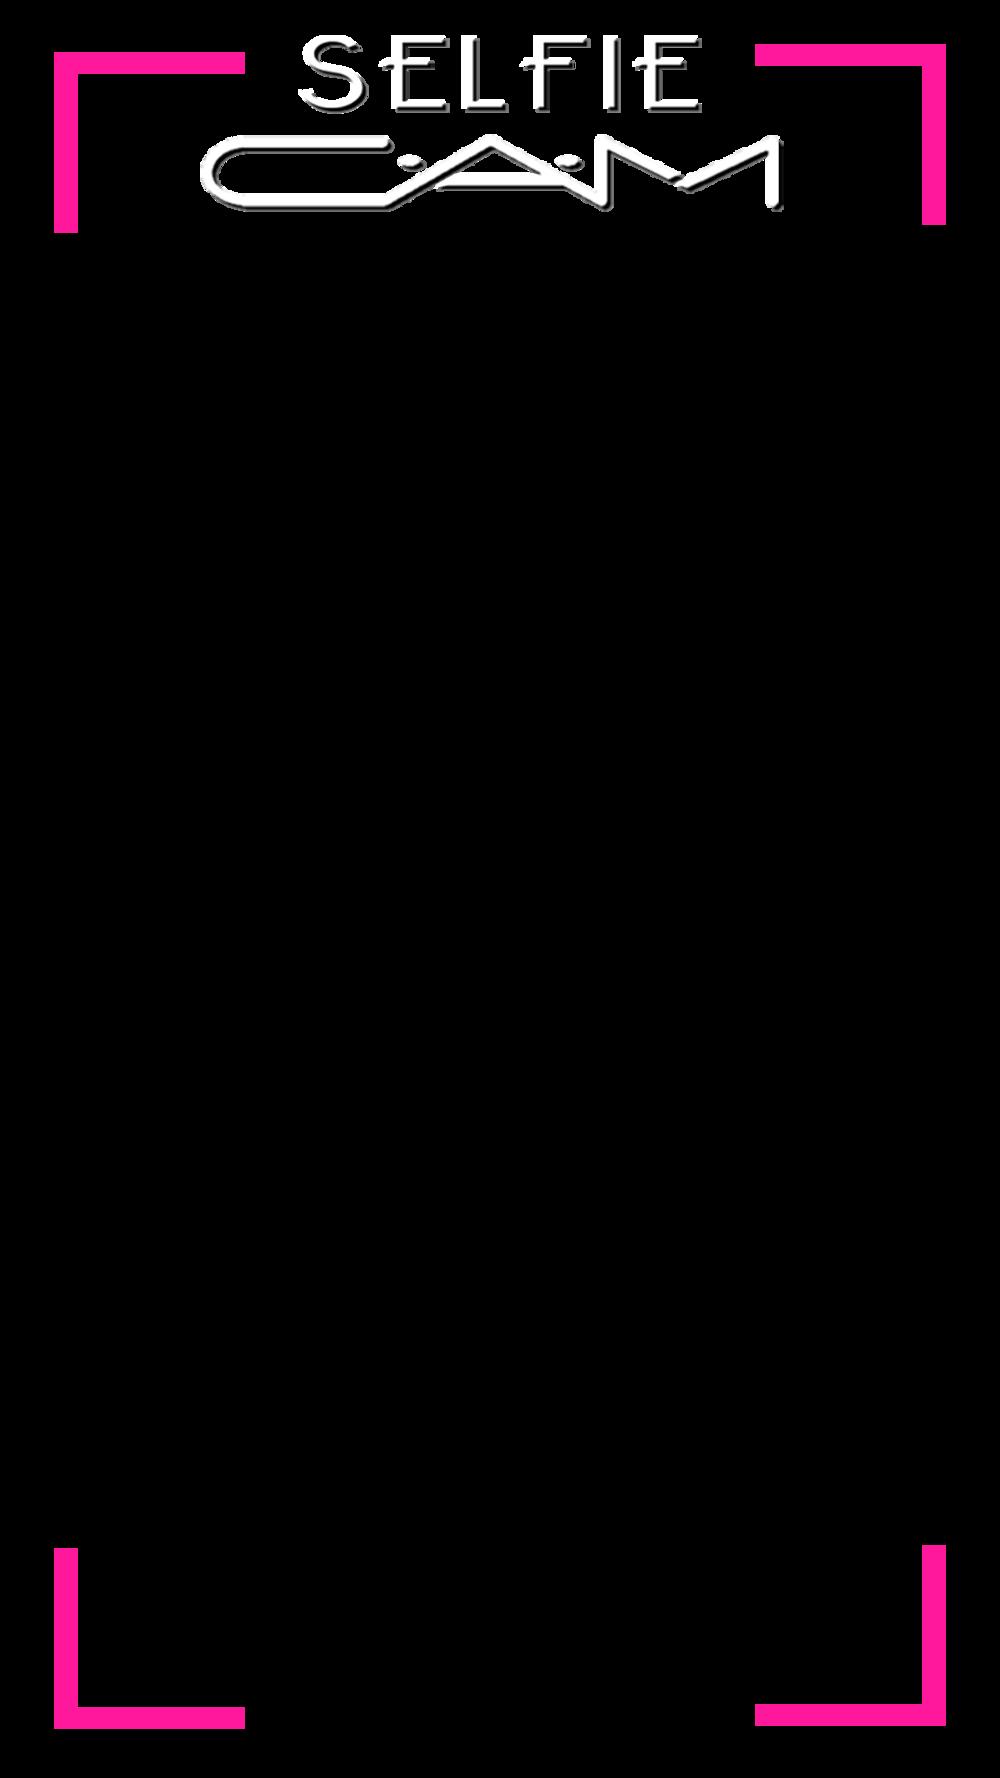 Cam Bat mitz selfie.png